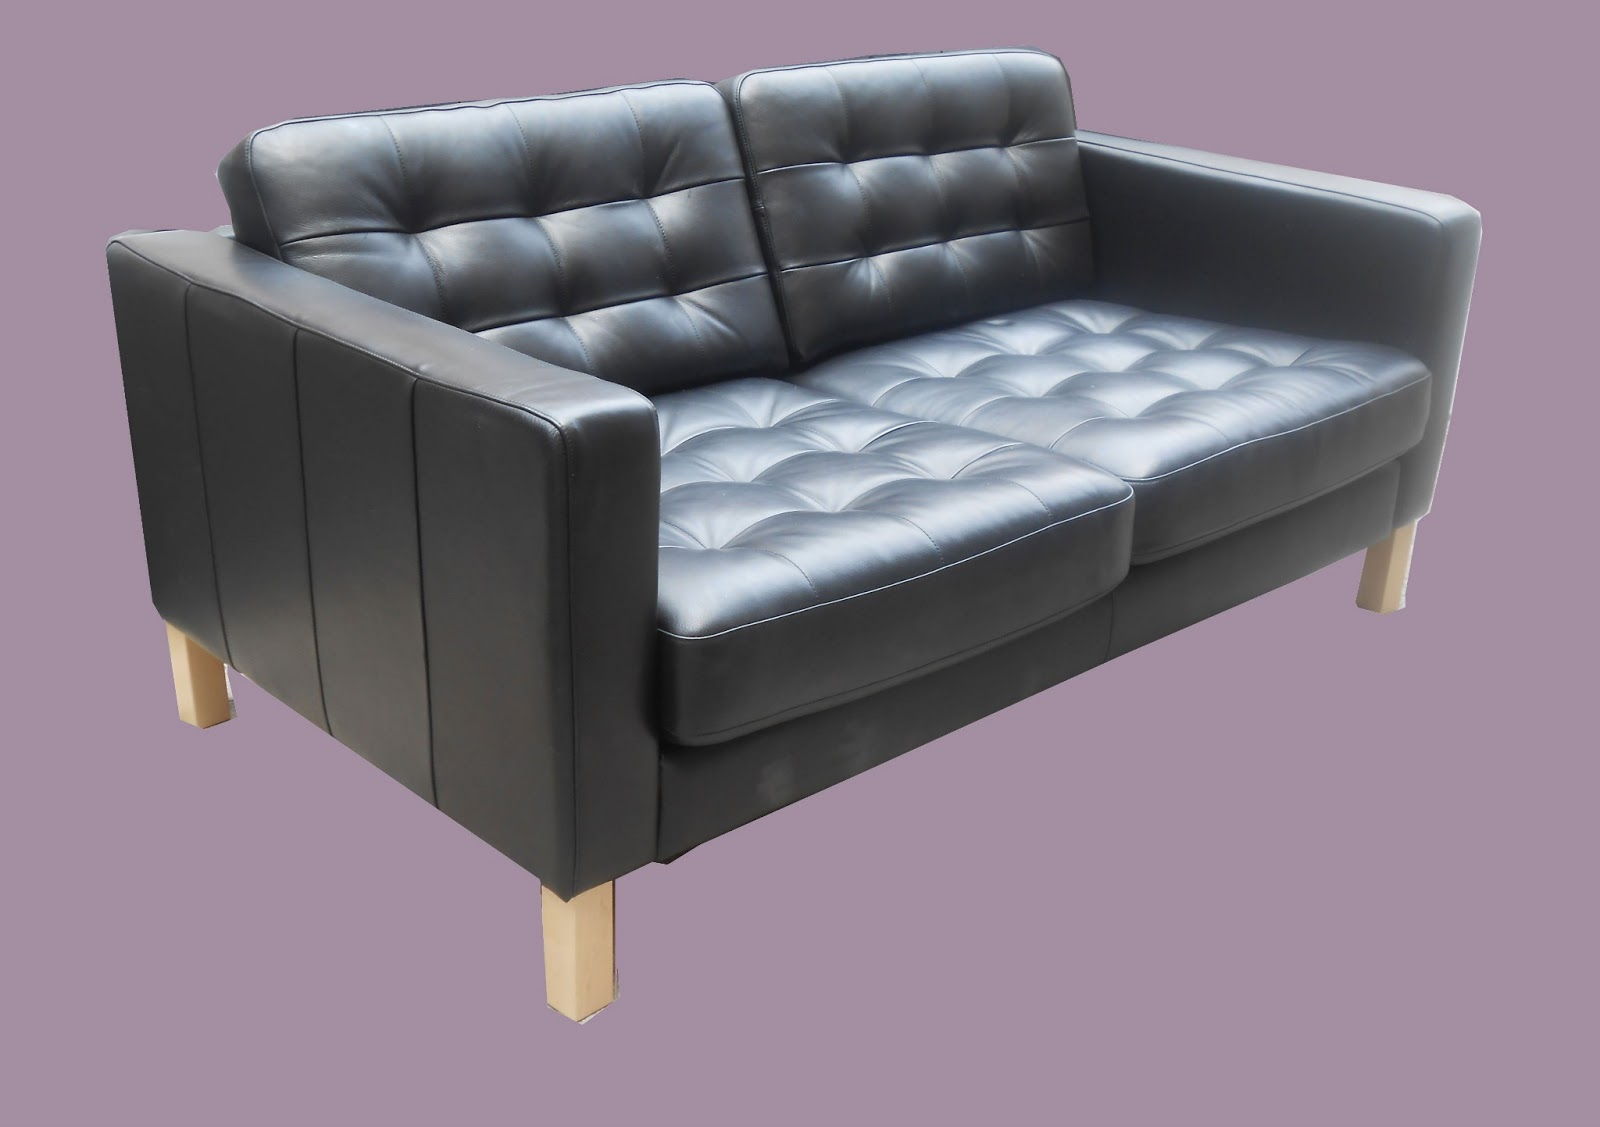 Stupendous Uhuru Furniture Collectibles Ikea Karlstad Black Leather Lamtechconsult Wood Chair Design Ideas Lamtechconsultcom